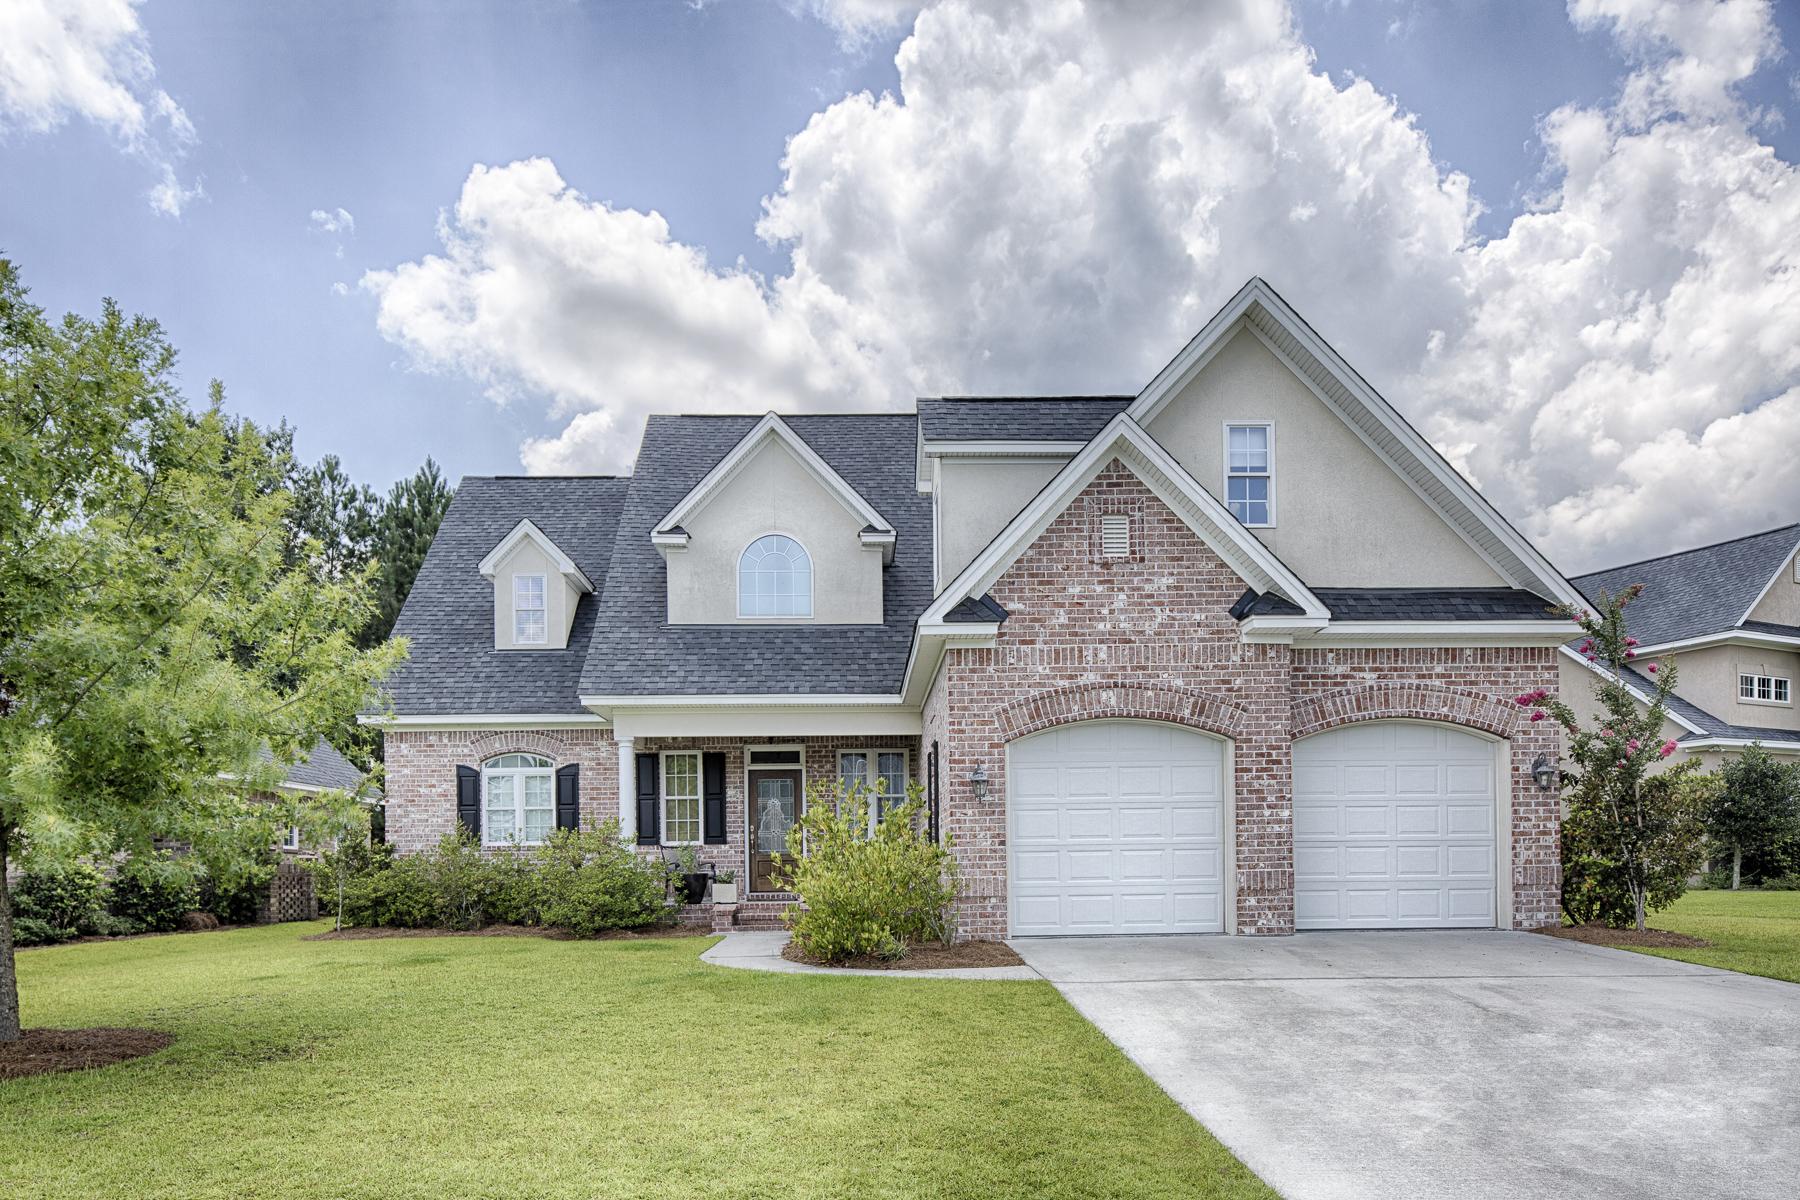 Single Family Home for Sale at 69 Misty Marsh Drive 69 Misty Marsh Dr. Savannah, Georgia 31419 United States